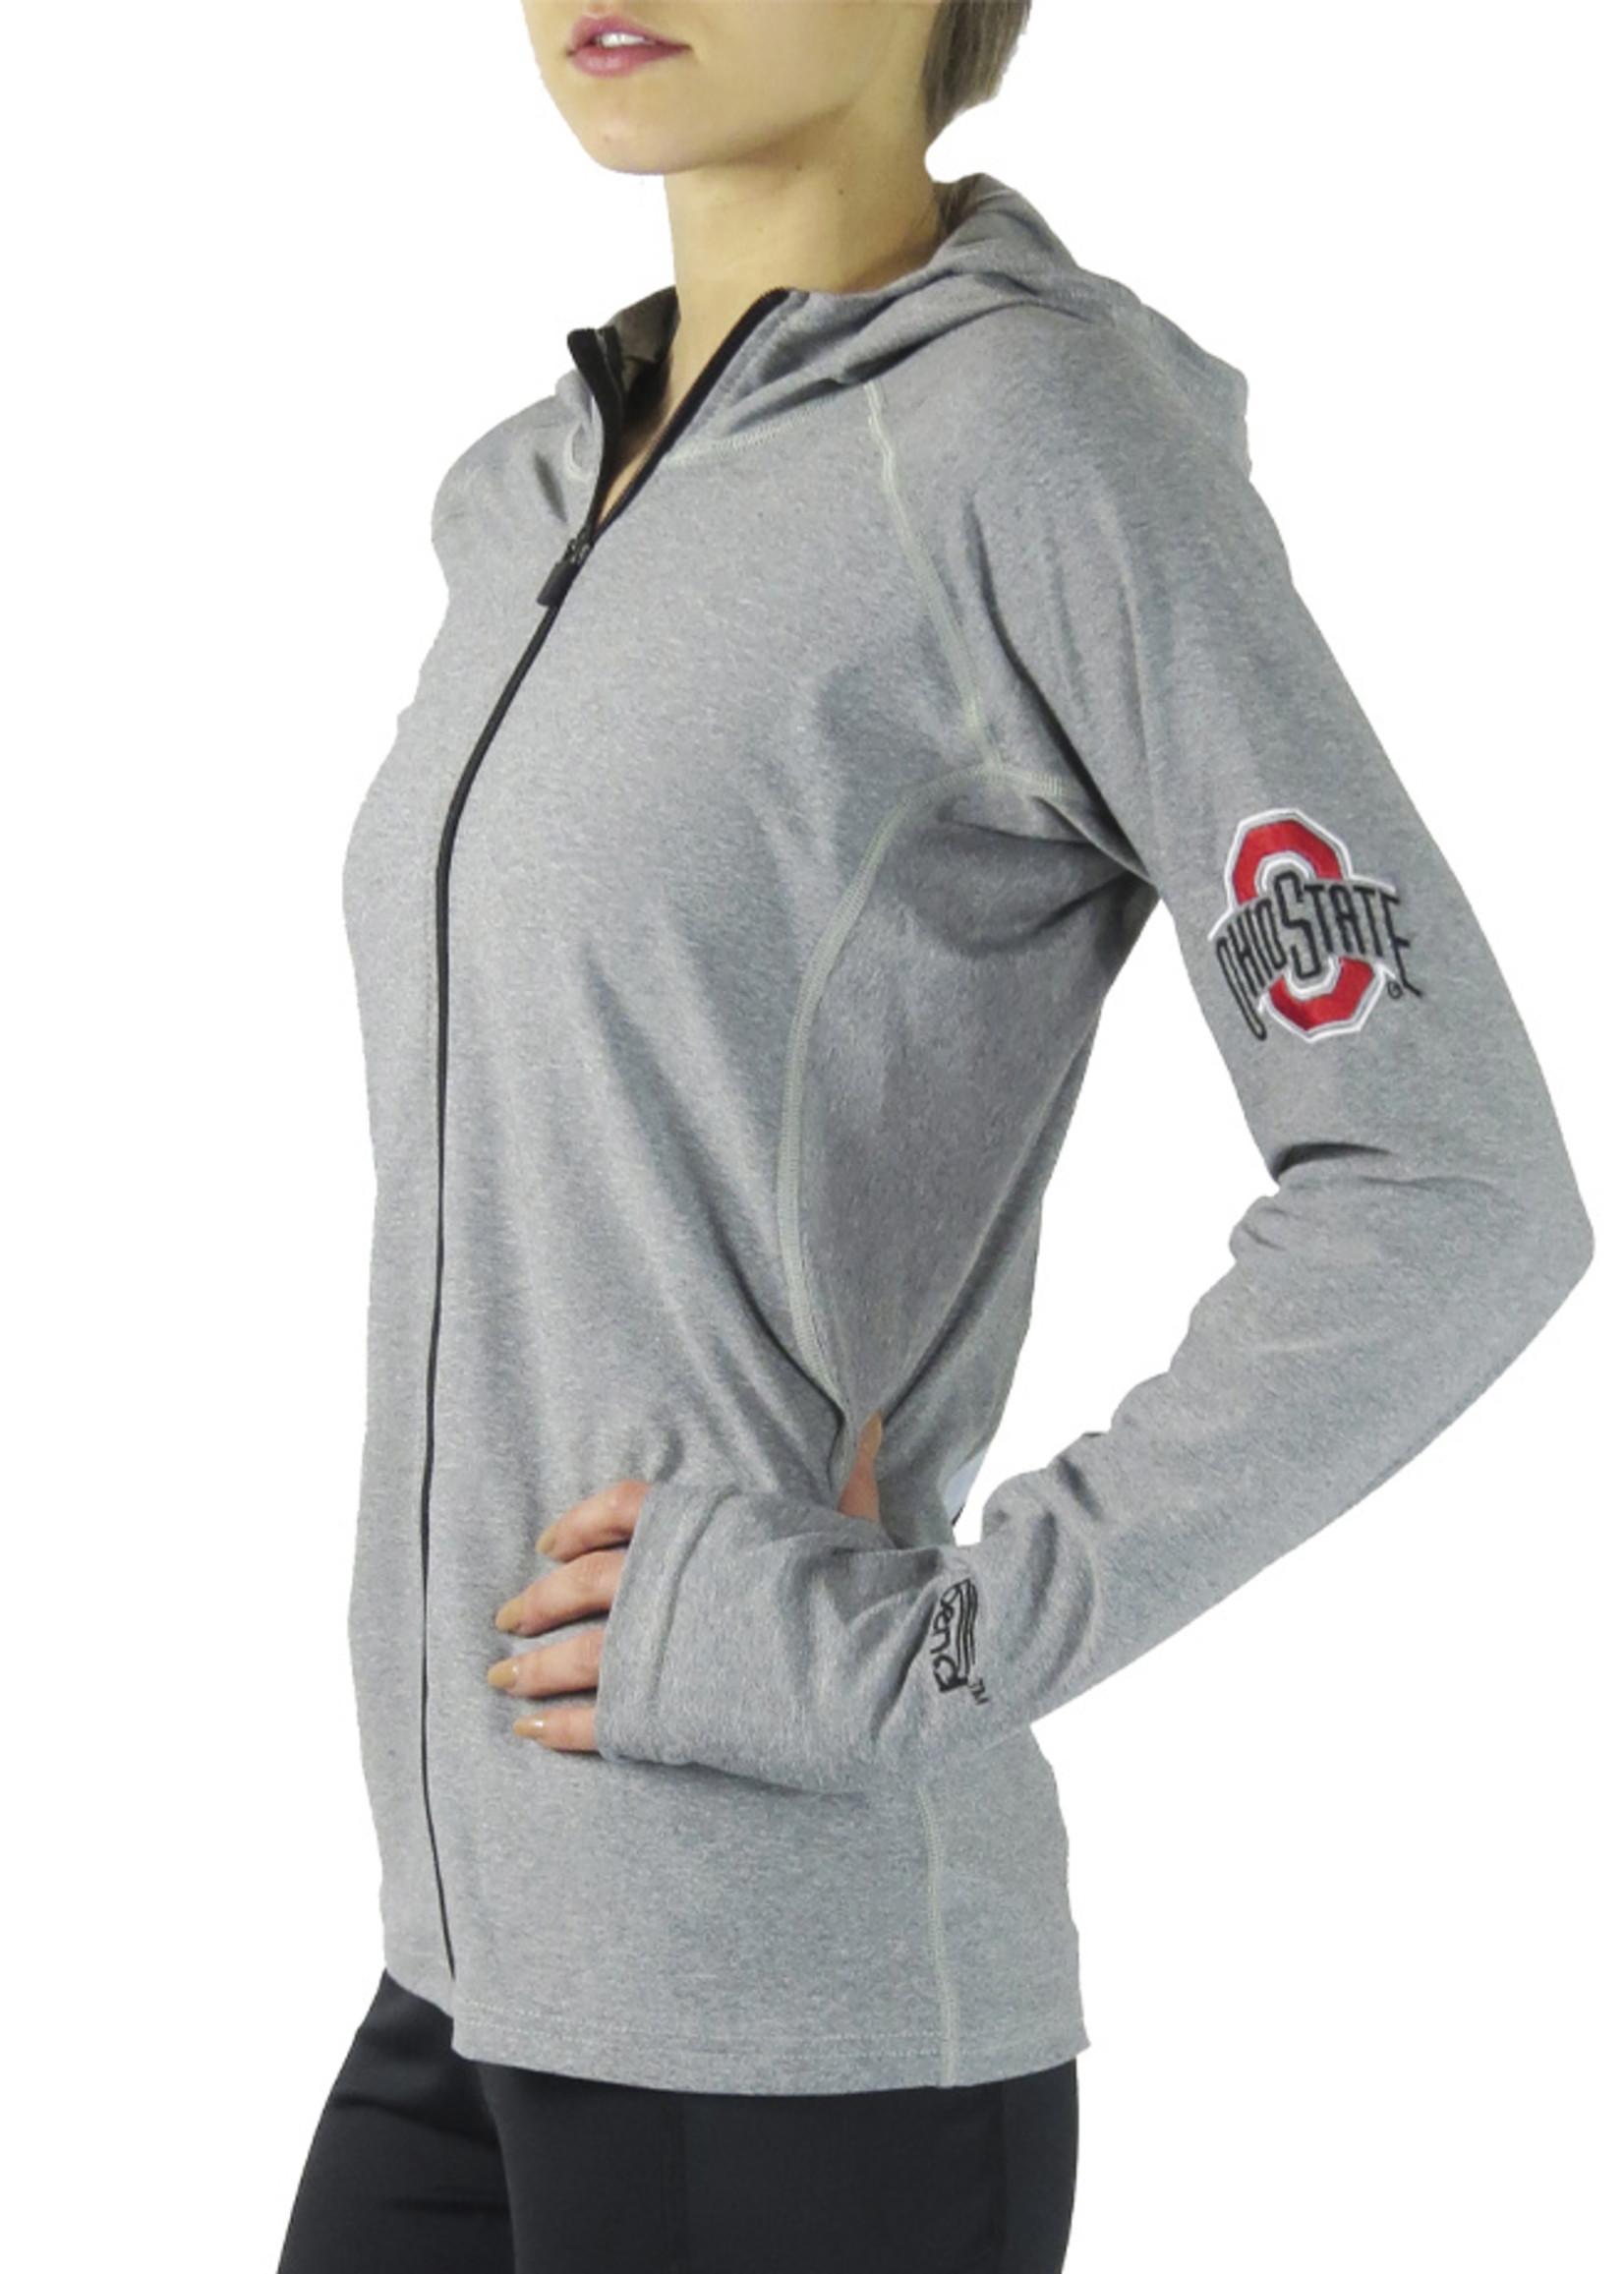 Bend Ohio State Buckeyes Womens Pony Tail Performance Hoodie/Grey